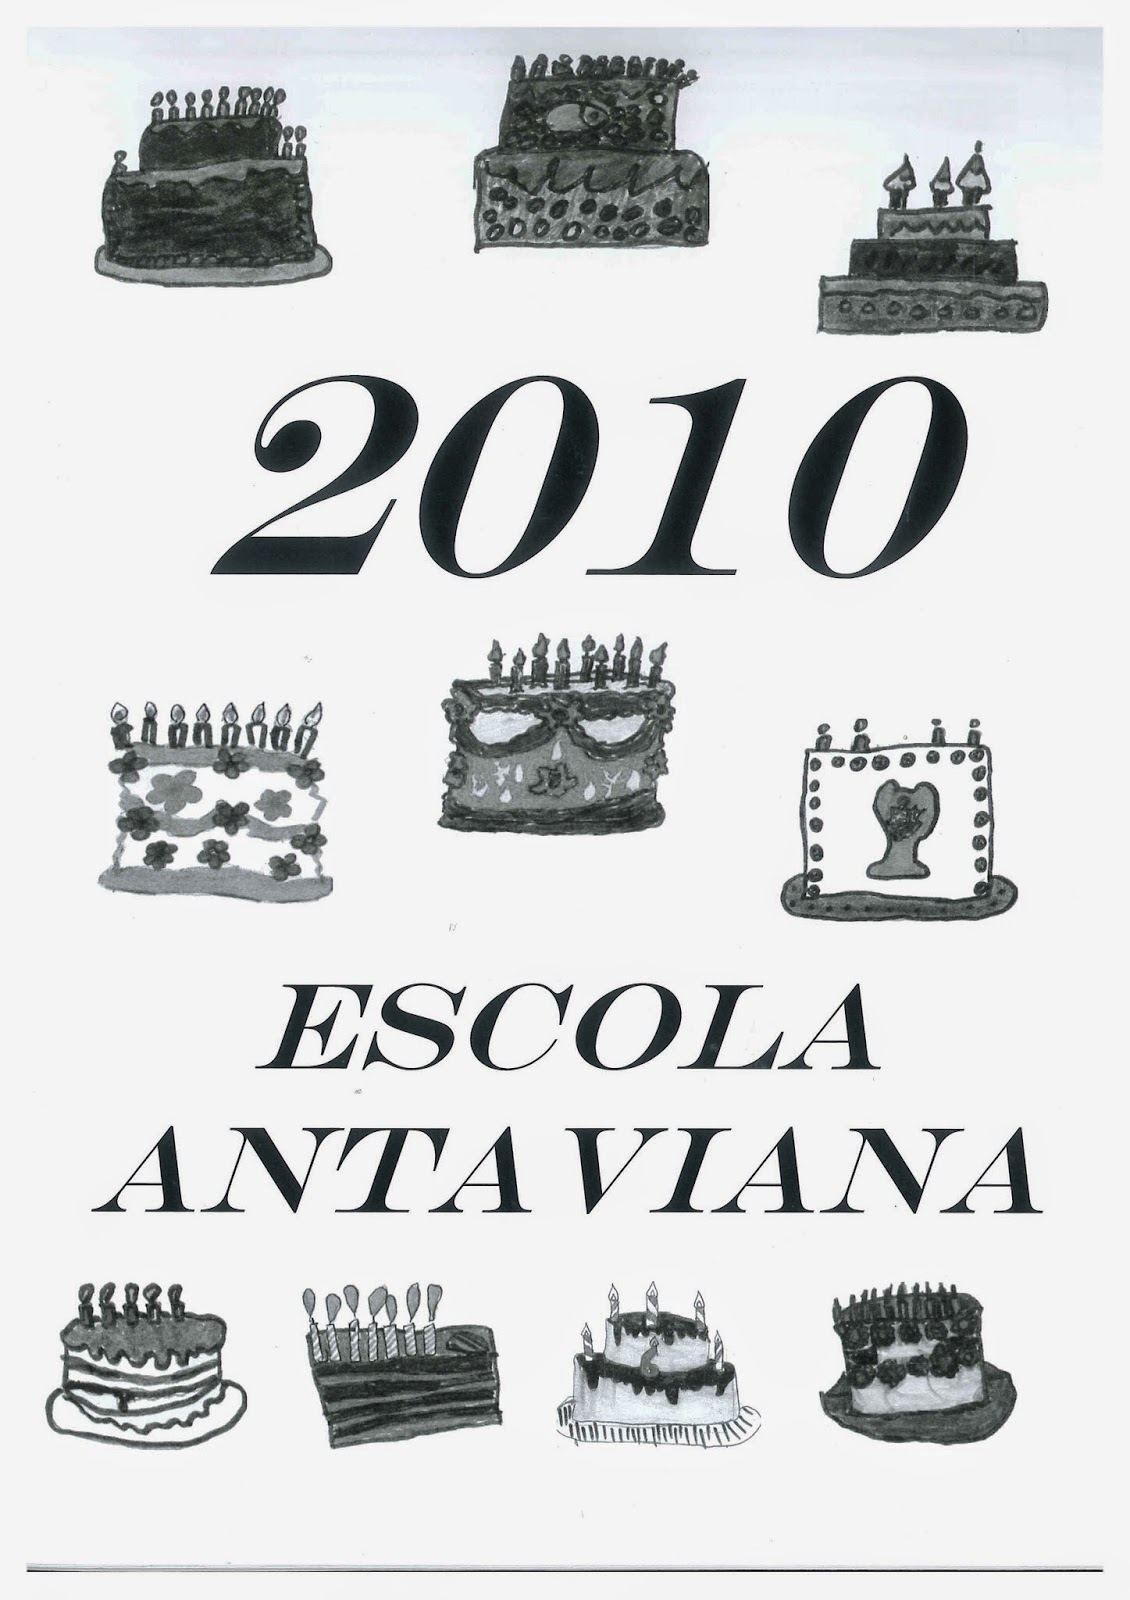 http://issuu.com/blocsdantaviana/docs/2010_201406031634